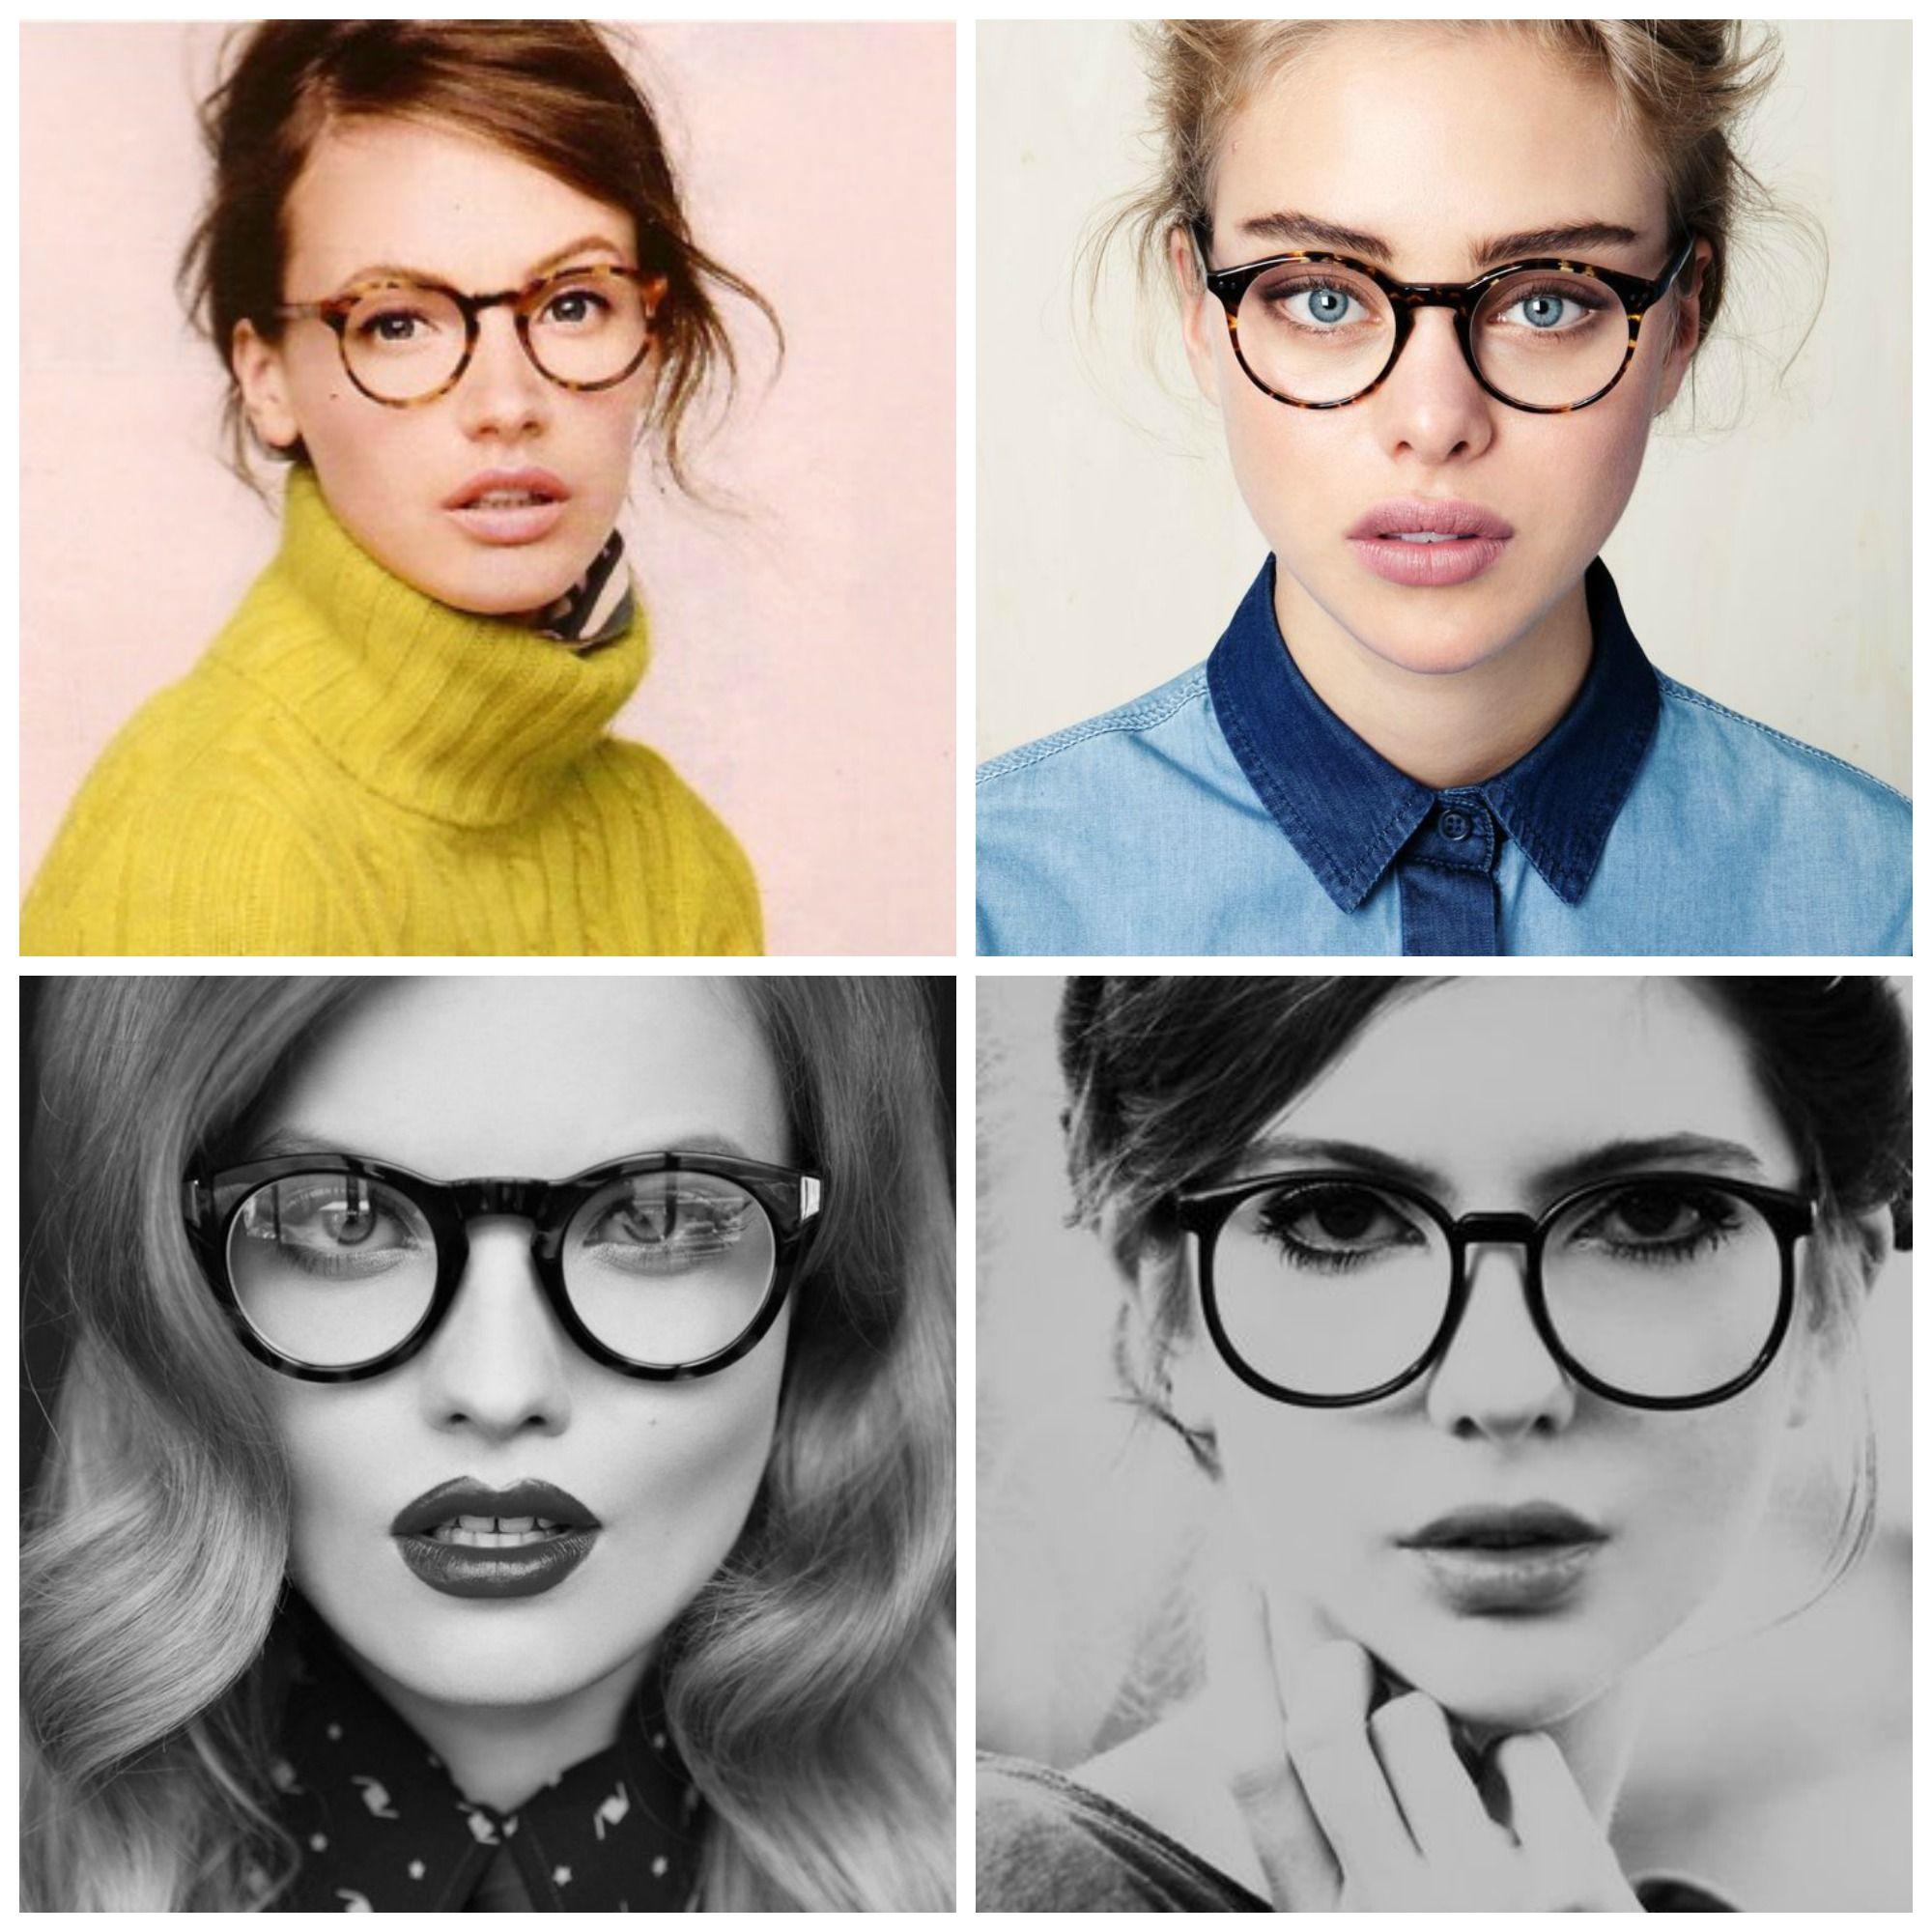 bb1c7f3240 gafas graduadas de moda | Tendencias al Aire | Huesca | Vicky Barrio ...